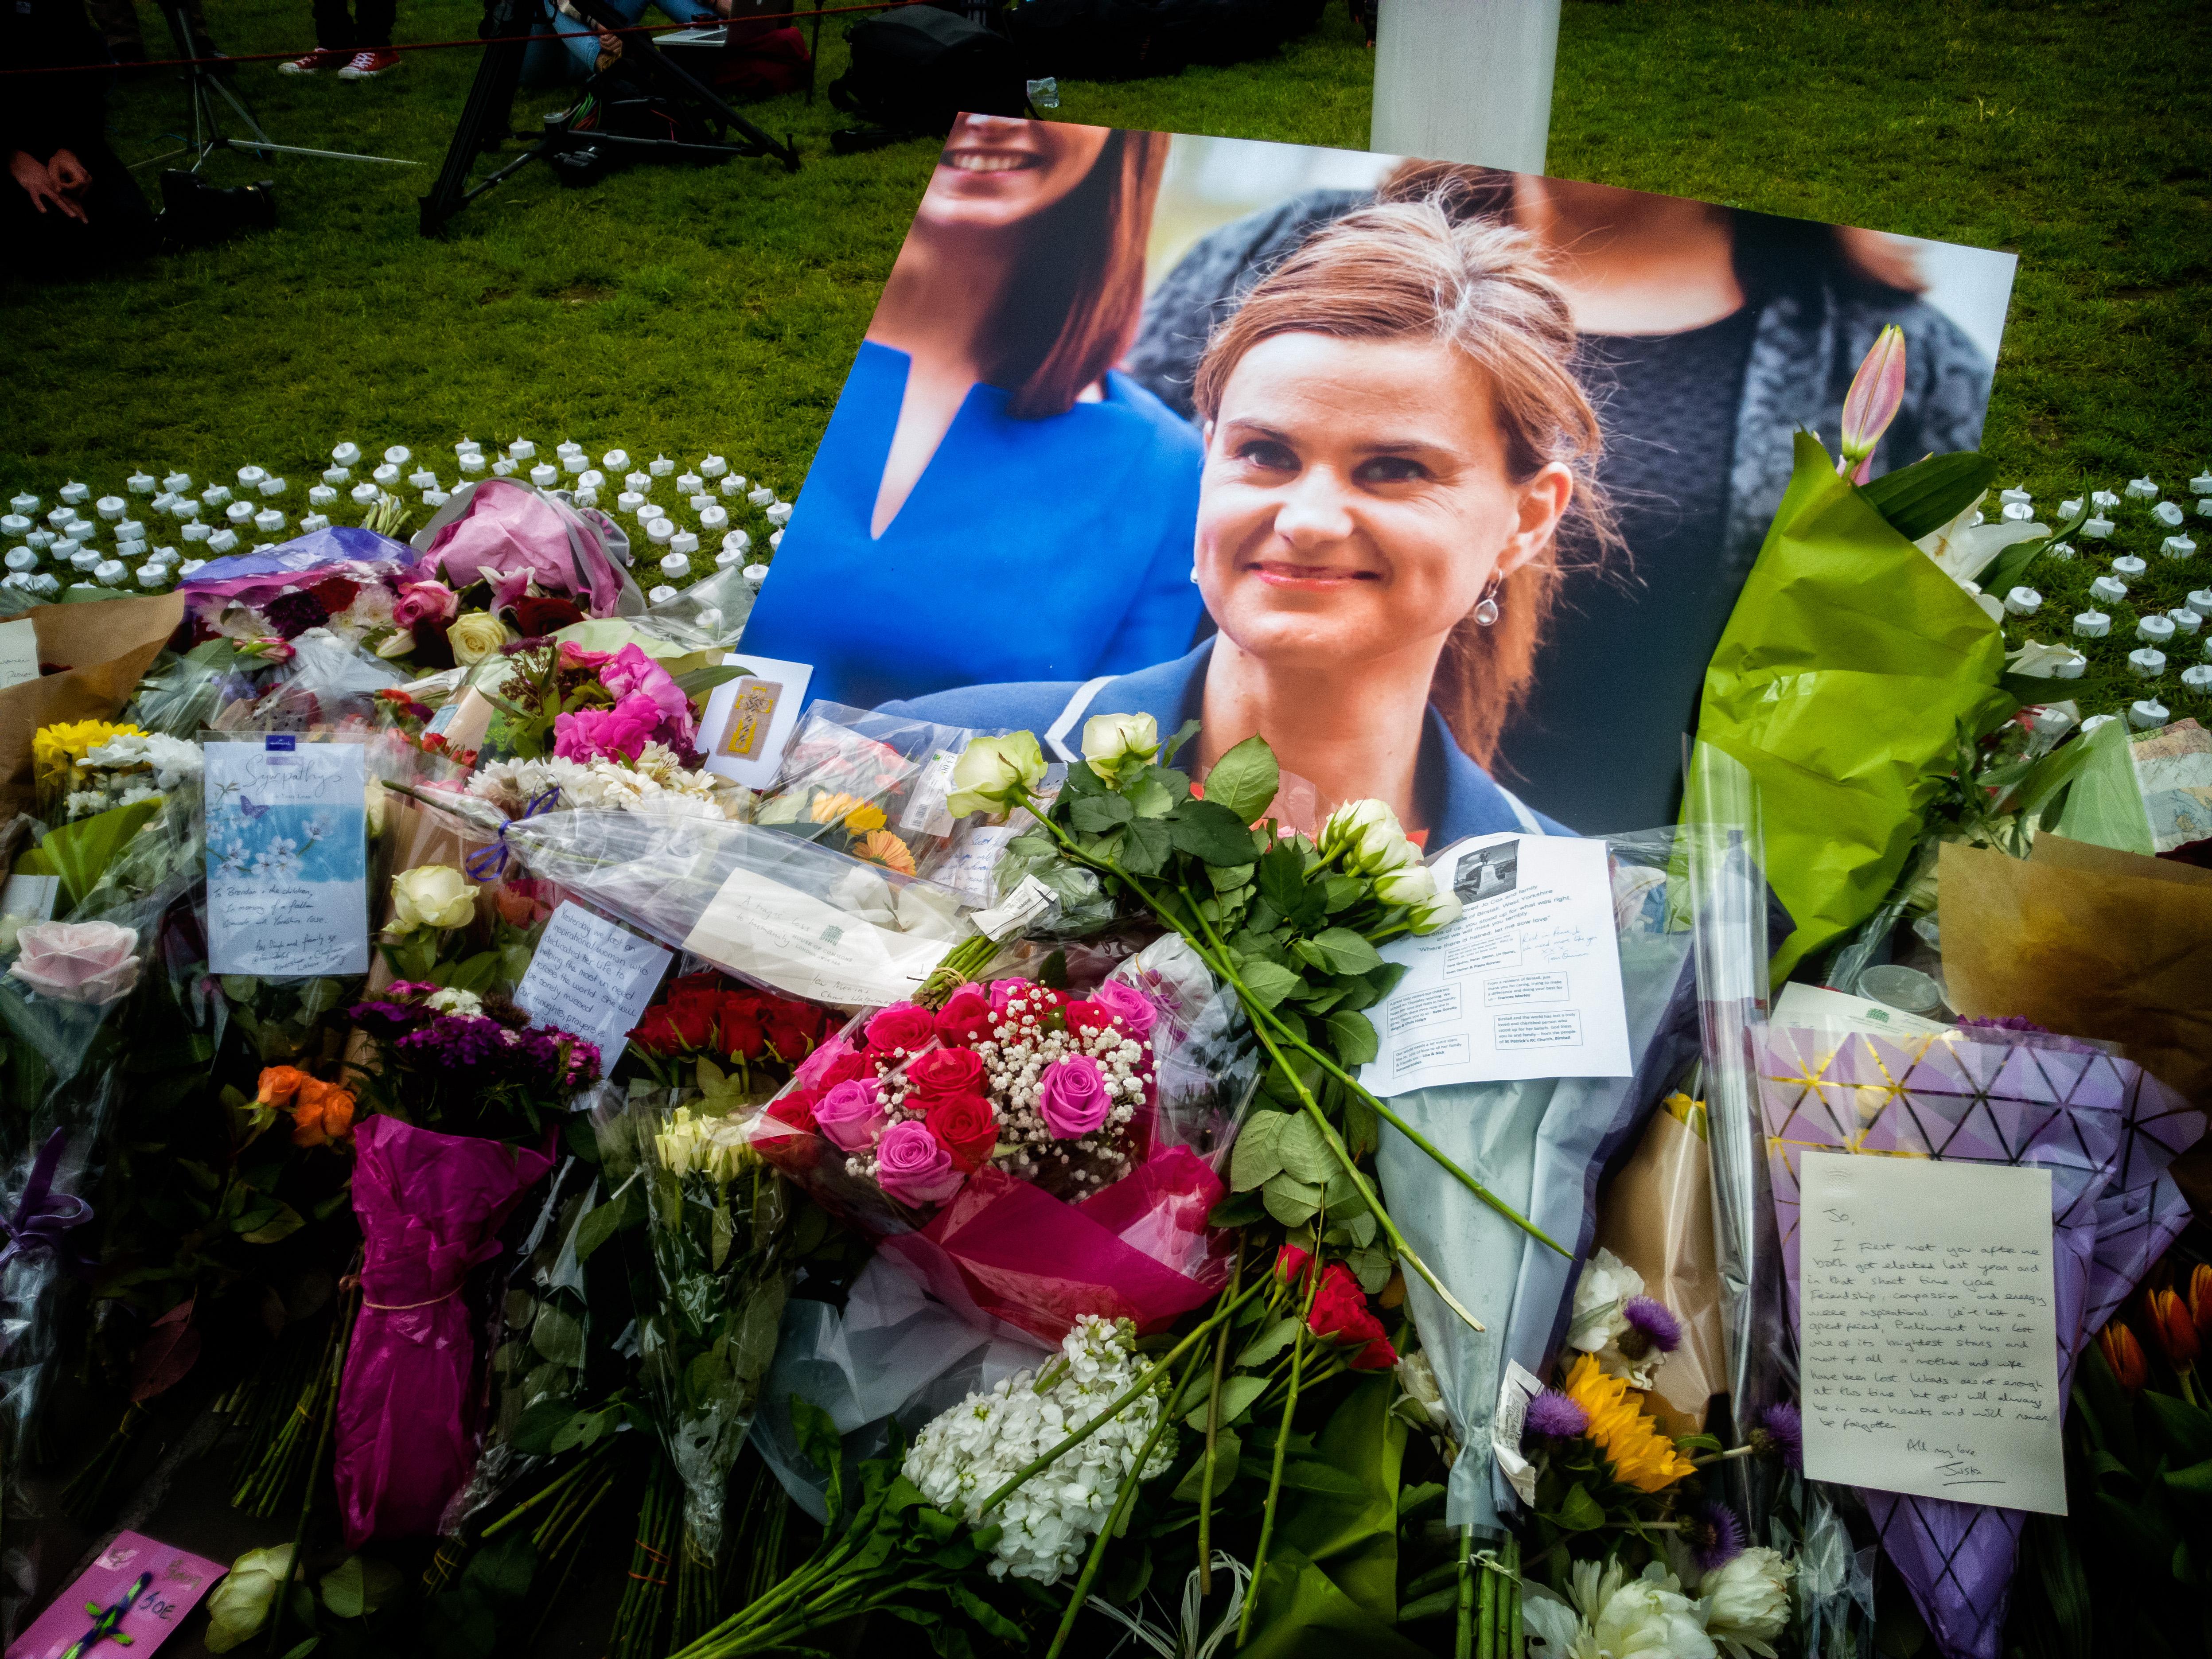 The Media Has a Huge Blind Spot on Terrorism